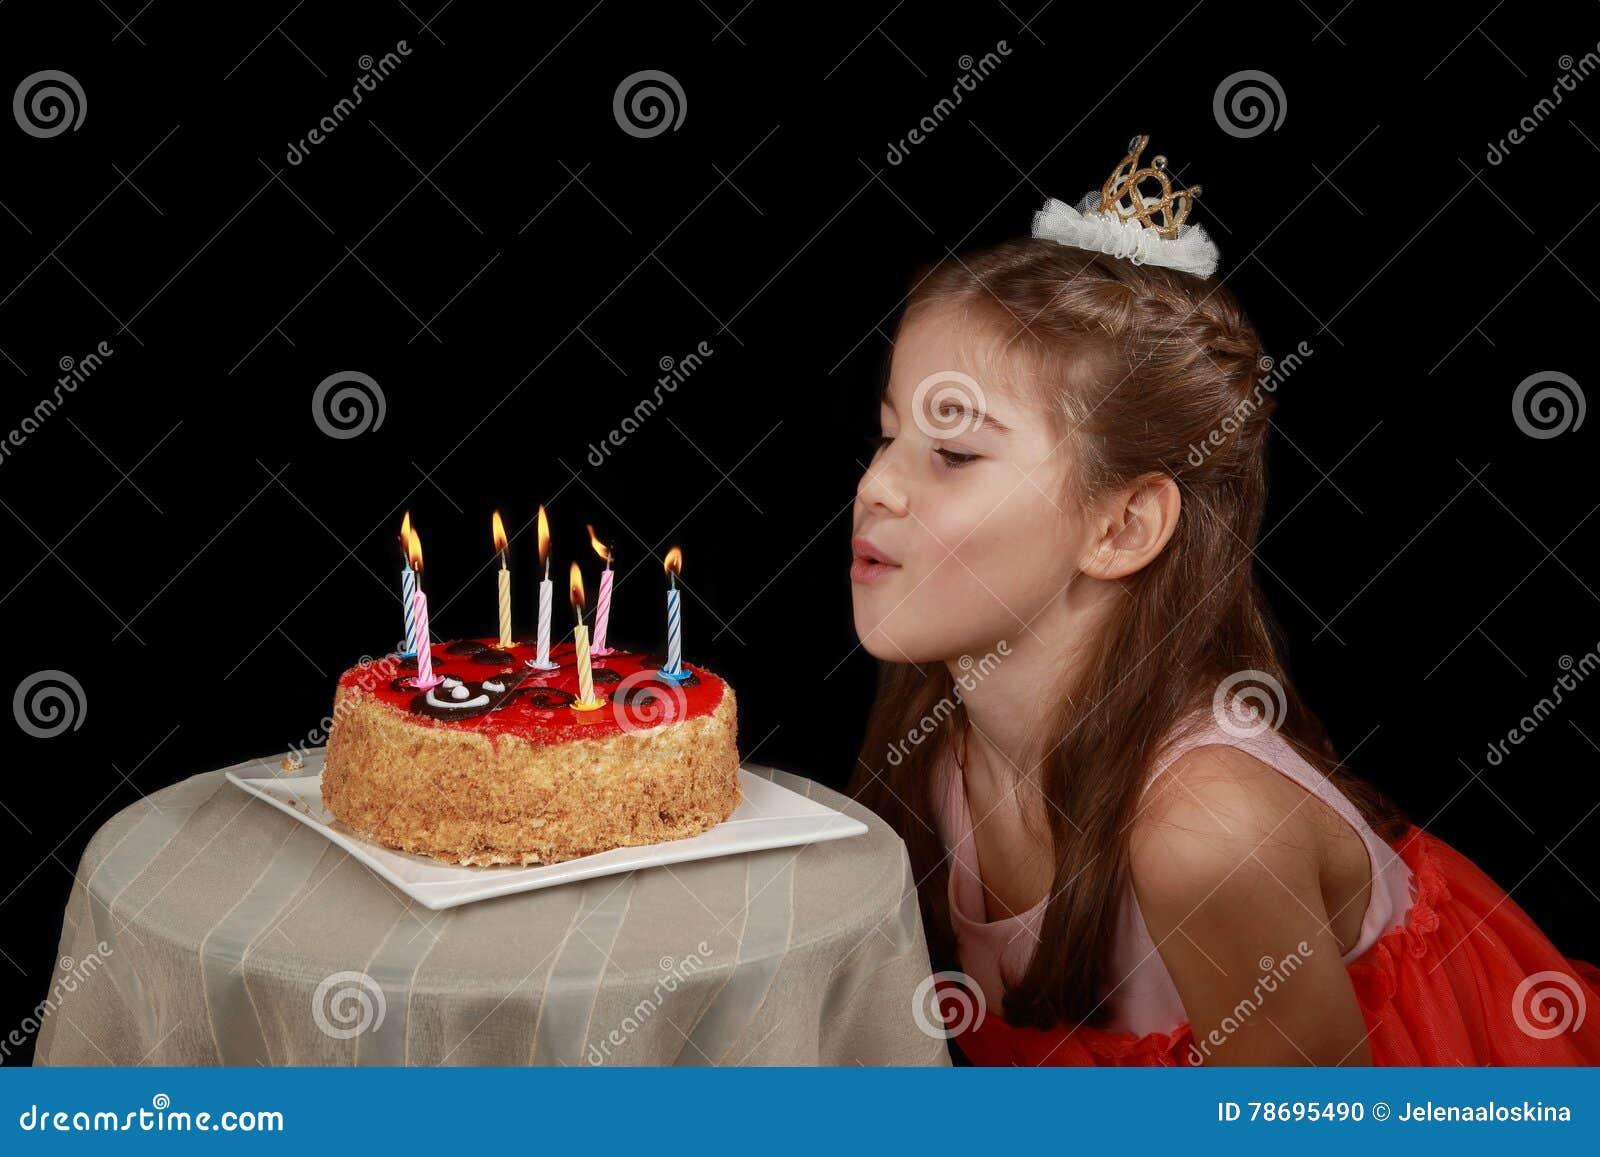 Girl With Birthday Cake Stock Photo Image Of Girl Dark 78695490